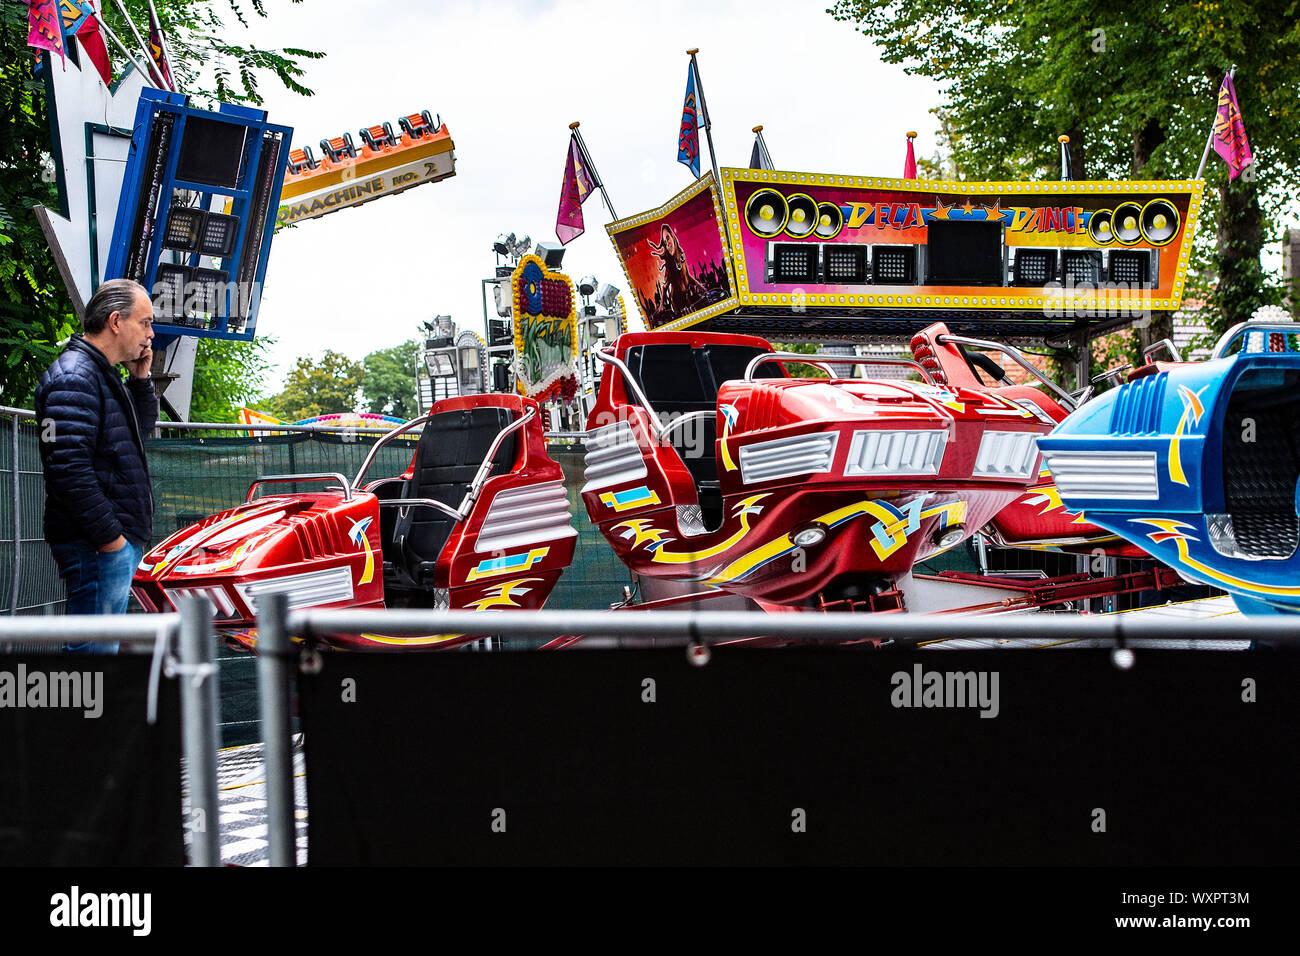 Wijchen, Nederland. 17th Sep, 2019. WIJCHEN, 17-09-2019, dutchnews, Frank Vale, owner of the fair ride Deca Dance Credit: Pro Shots/Alamy Live News Stock Photo